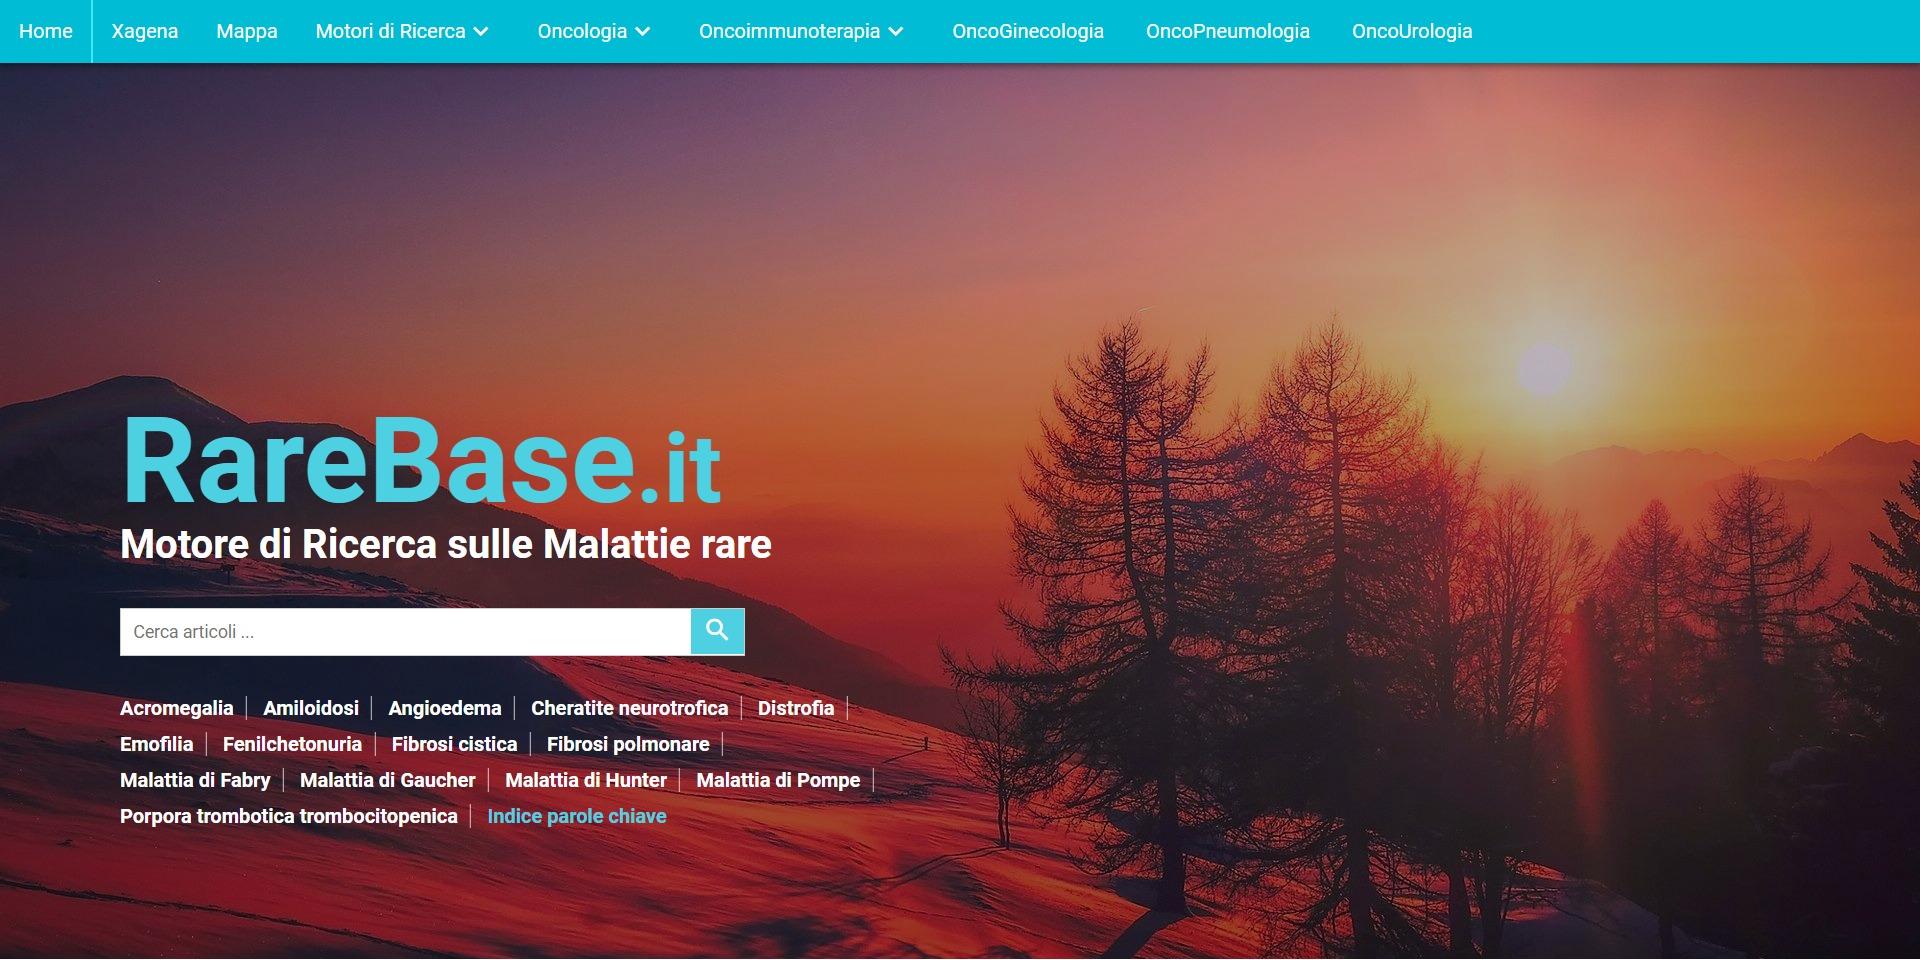 RareBase